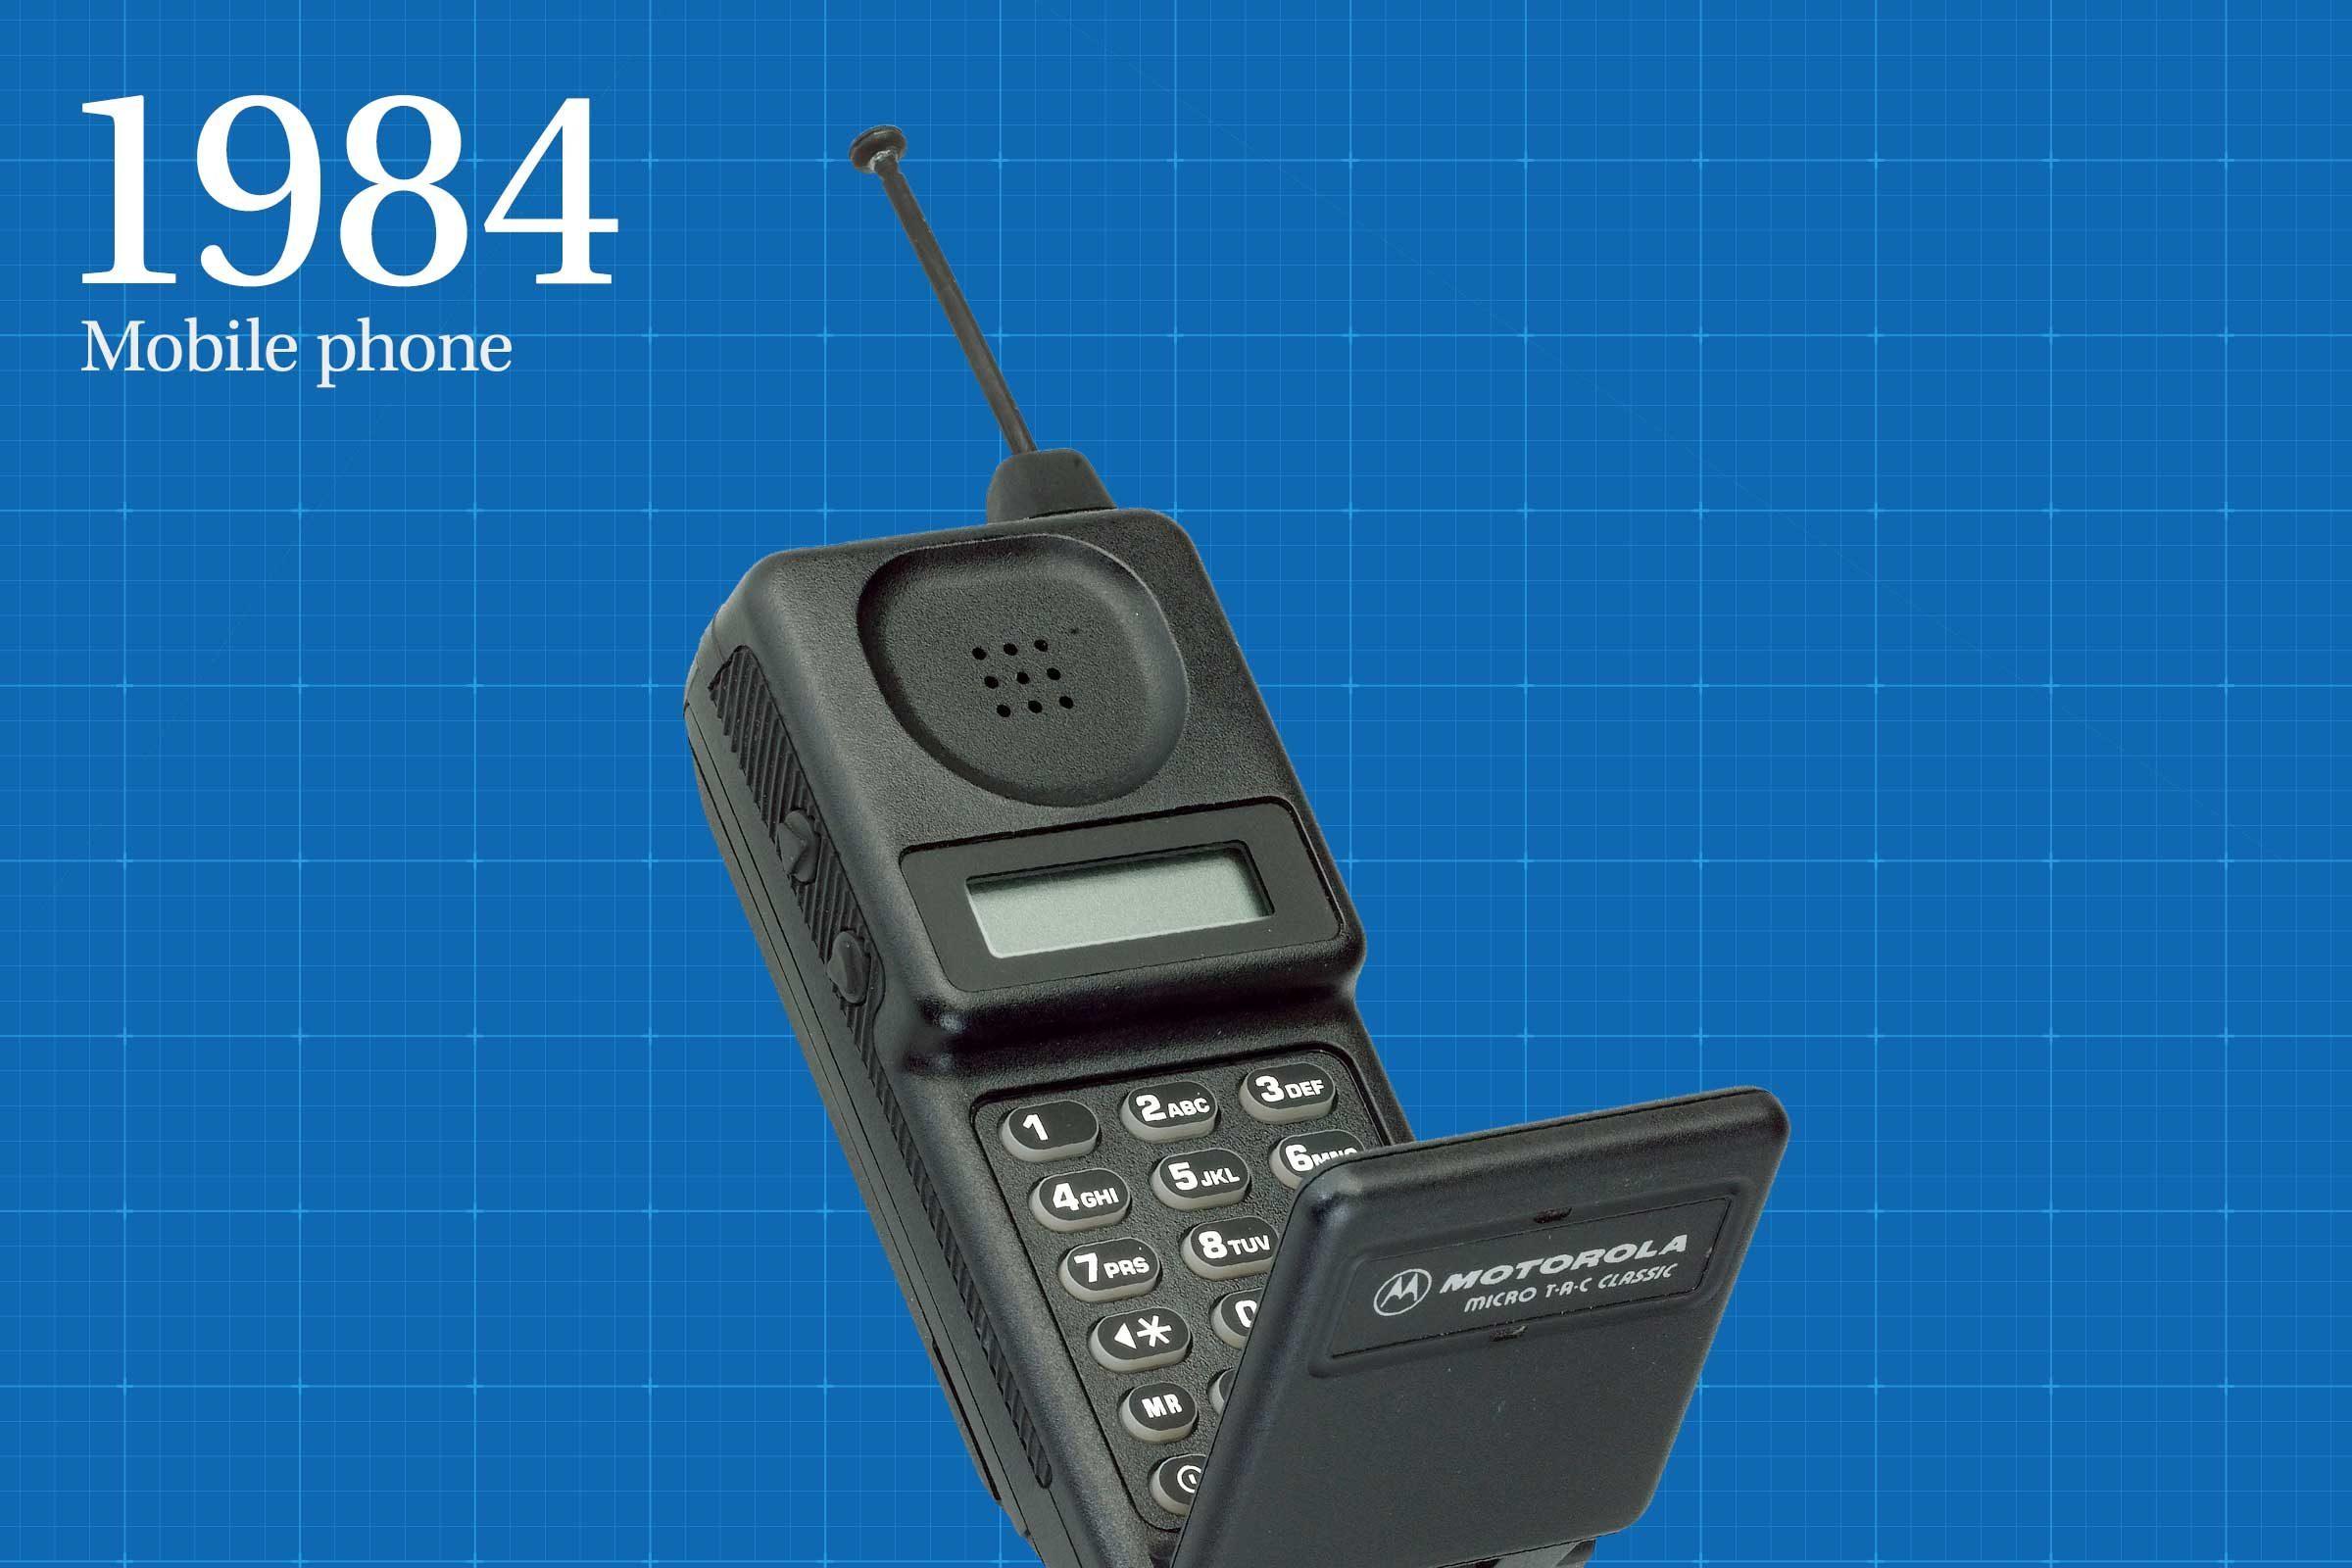 1984: Mobile phone